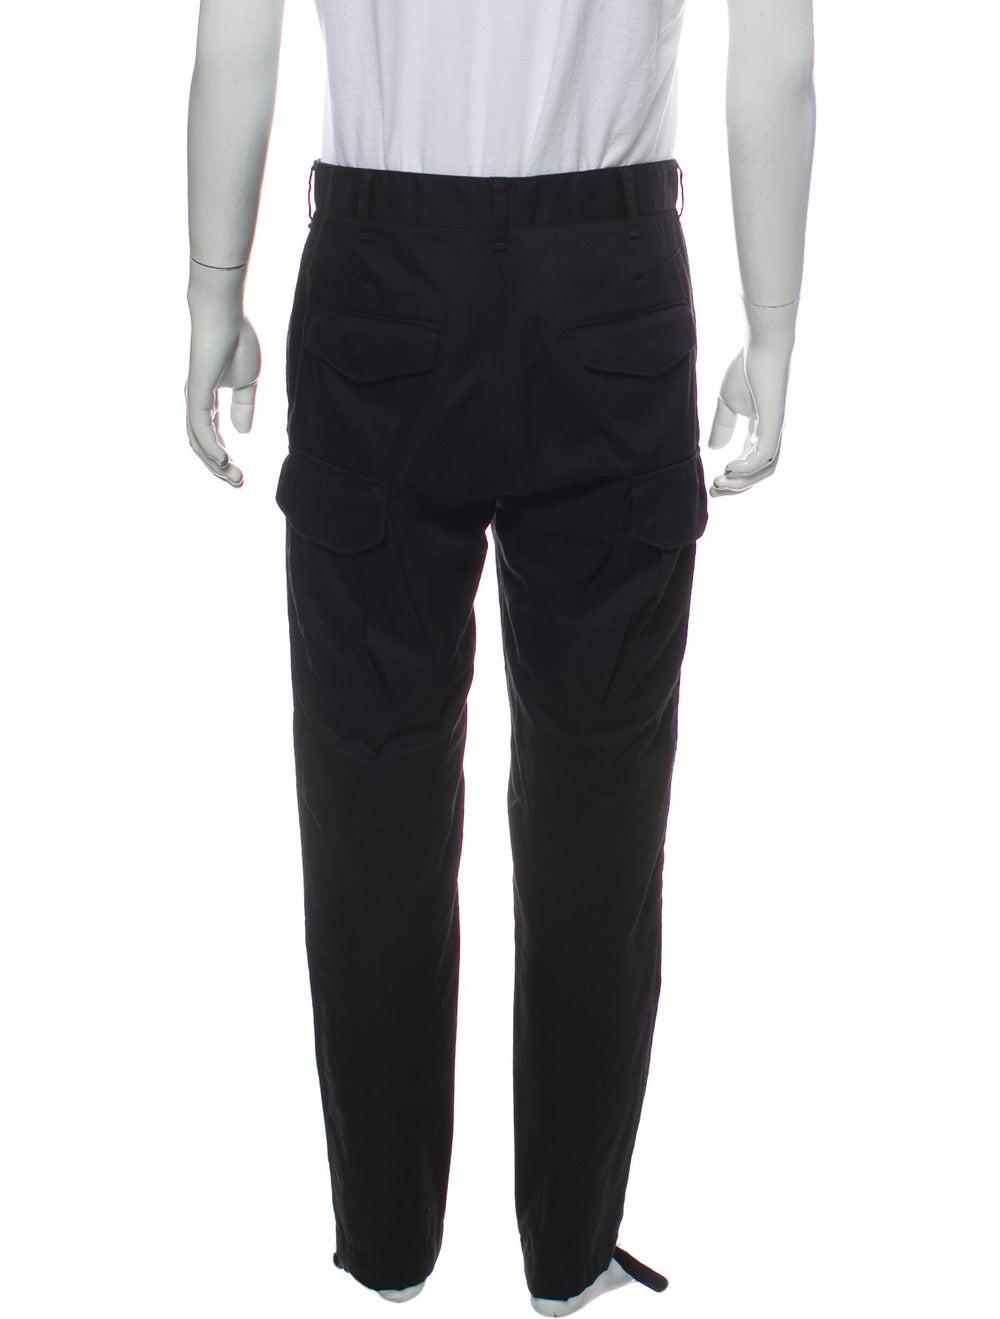 Rag & Bone Cargo Pants Black - image 3